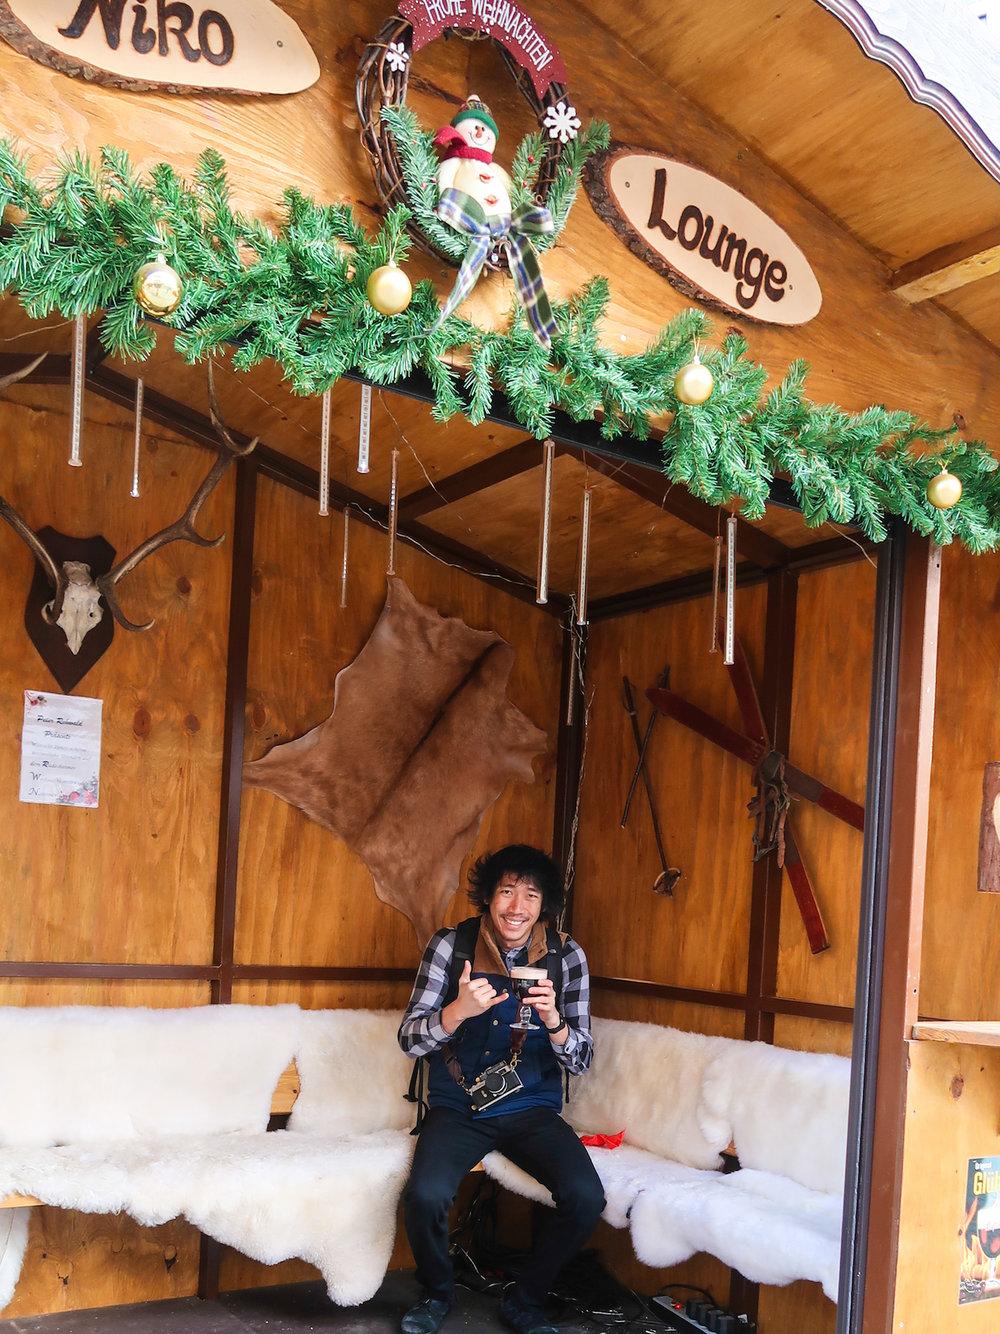 Rüdesheim Am Rhein Christmas Market Glühbier Atis Puampai Divine Tio